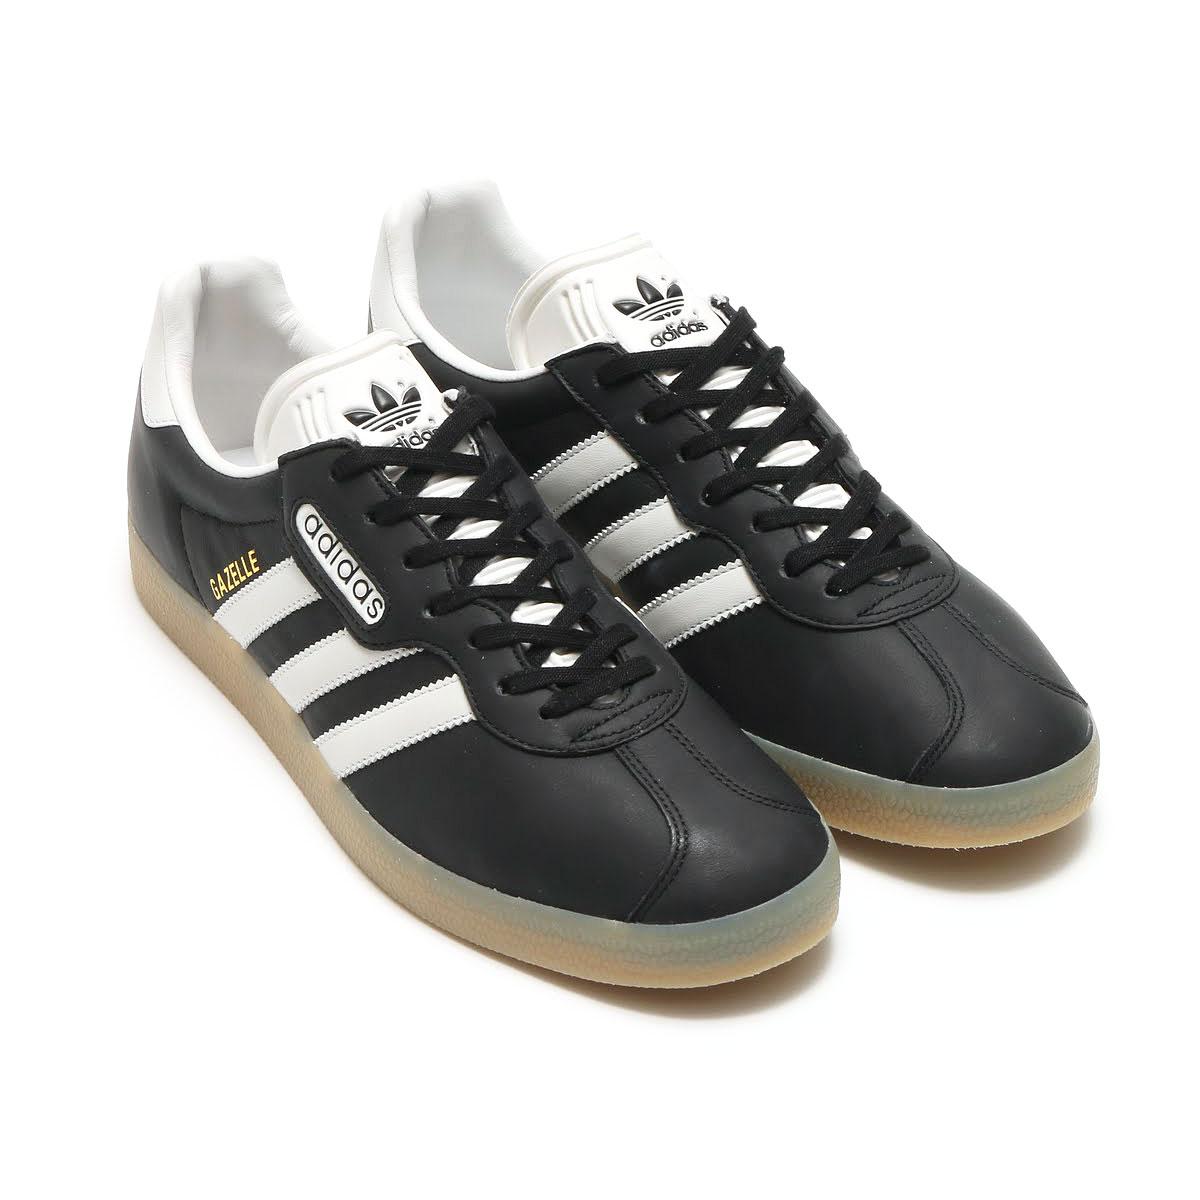 adidas Originals GAZELLE SP (アディダス ガゼル SP) CORE BLACK/VINTAGE WHITE S15/GUM4【メンズ レディース スニーカー】17SS-I